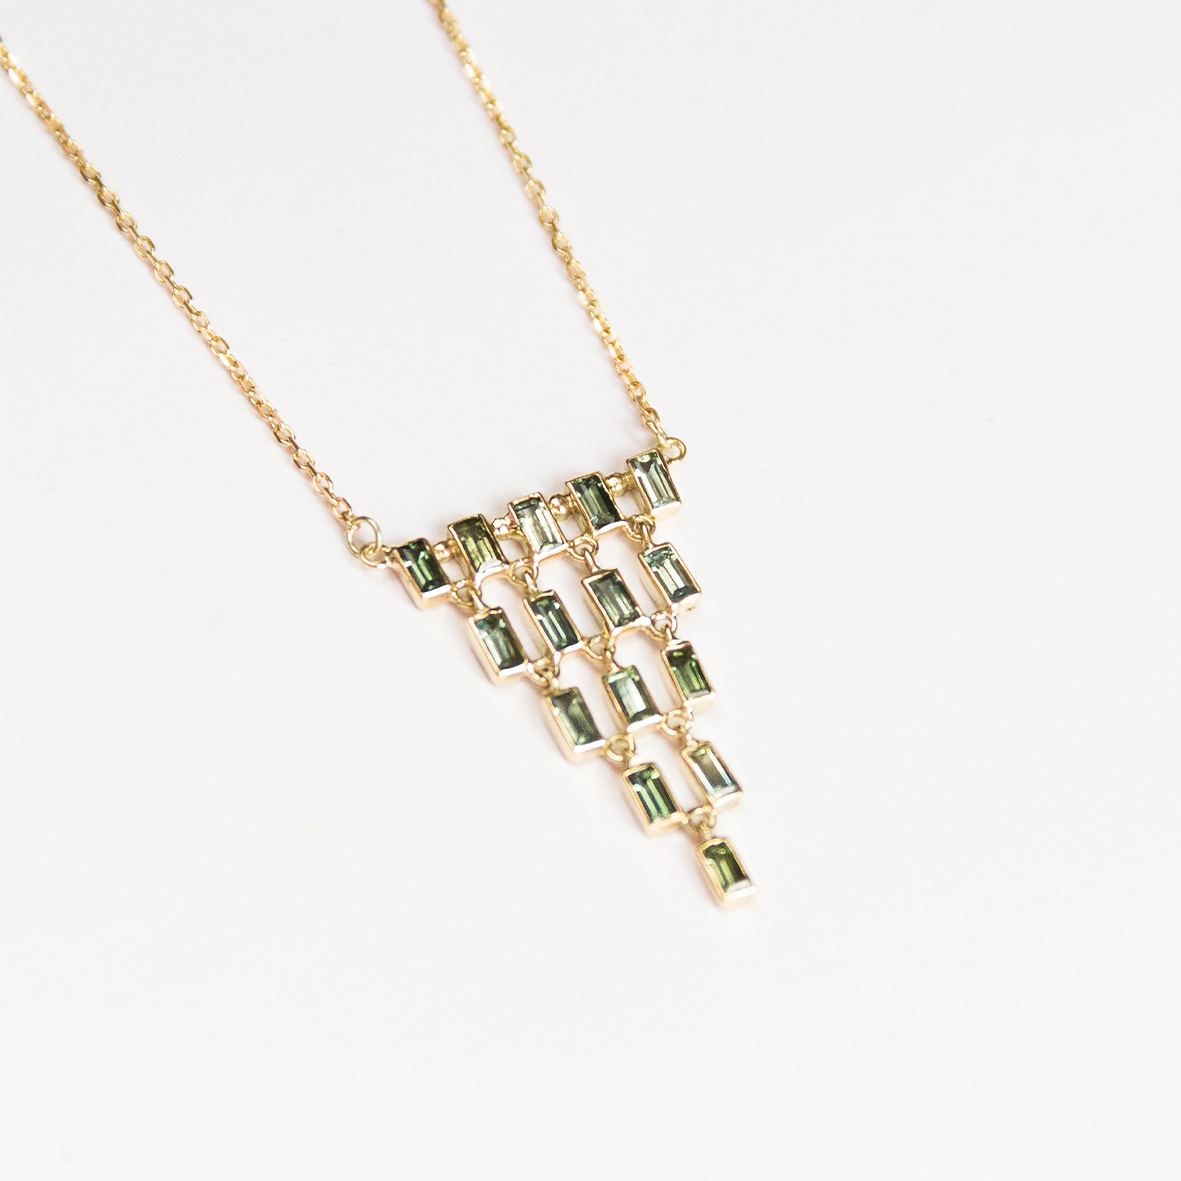 6. OONA_philo_principal_green baguette cascade necklace